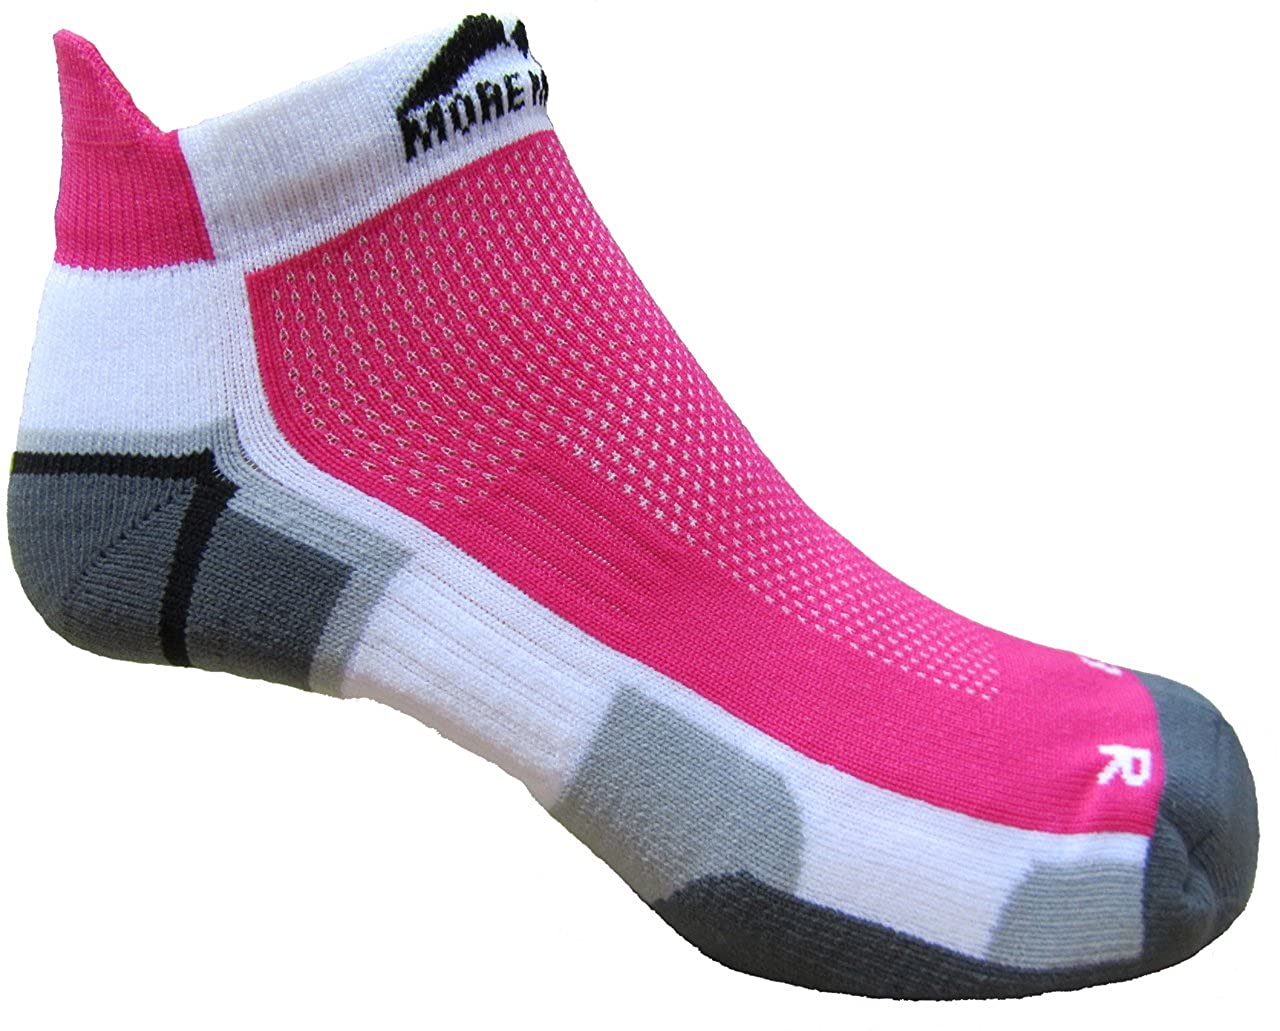 More Mile Damen kurze gepolsterte Laufsocken MIAMI MM1704 Weiß/Pink